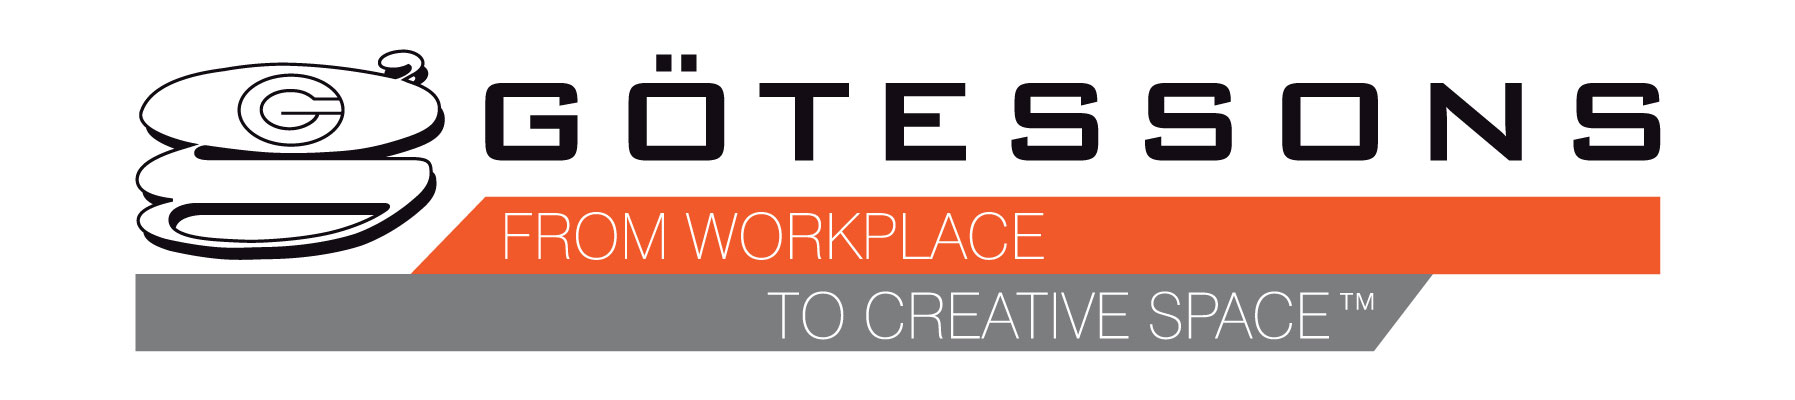 Götessons-Logo.jpg